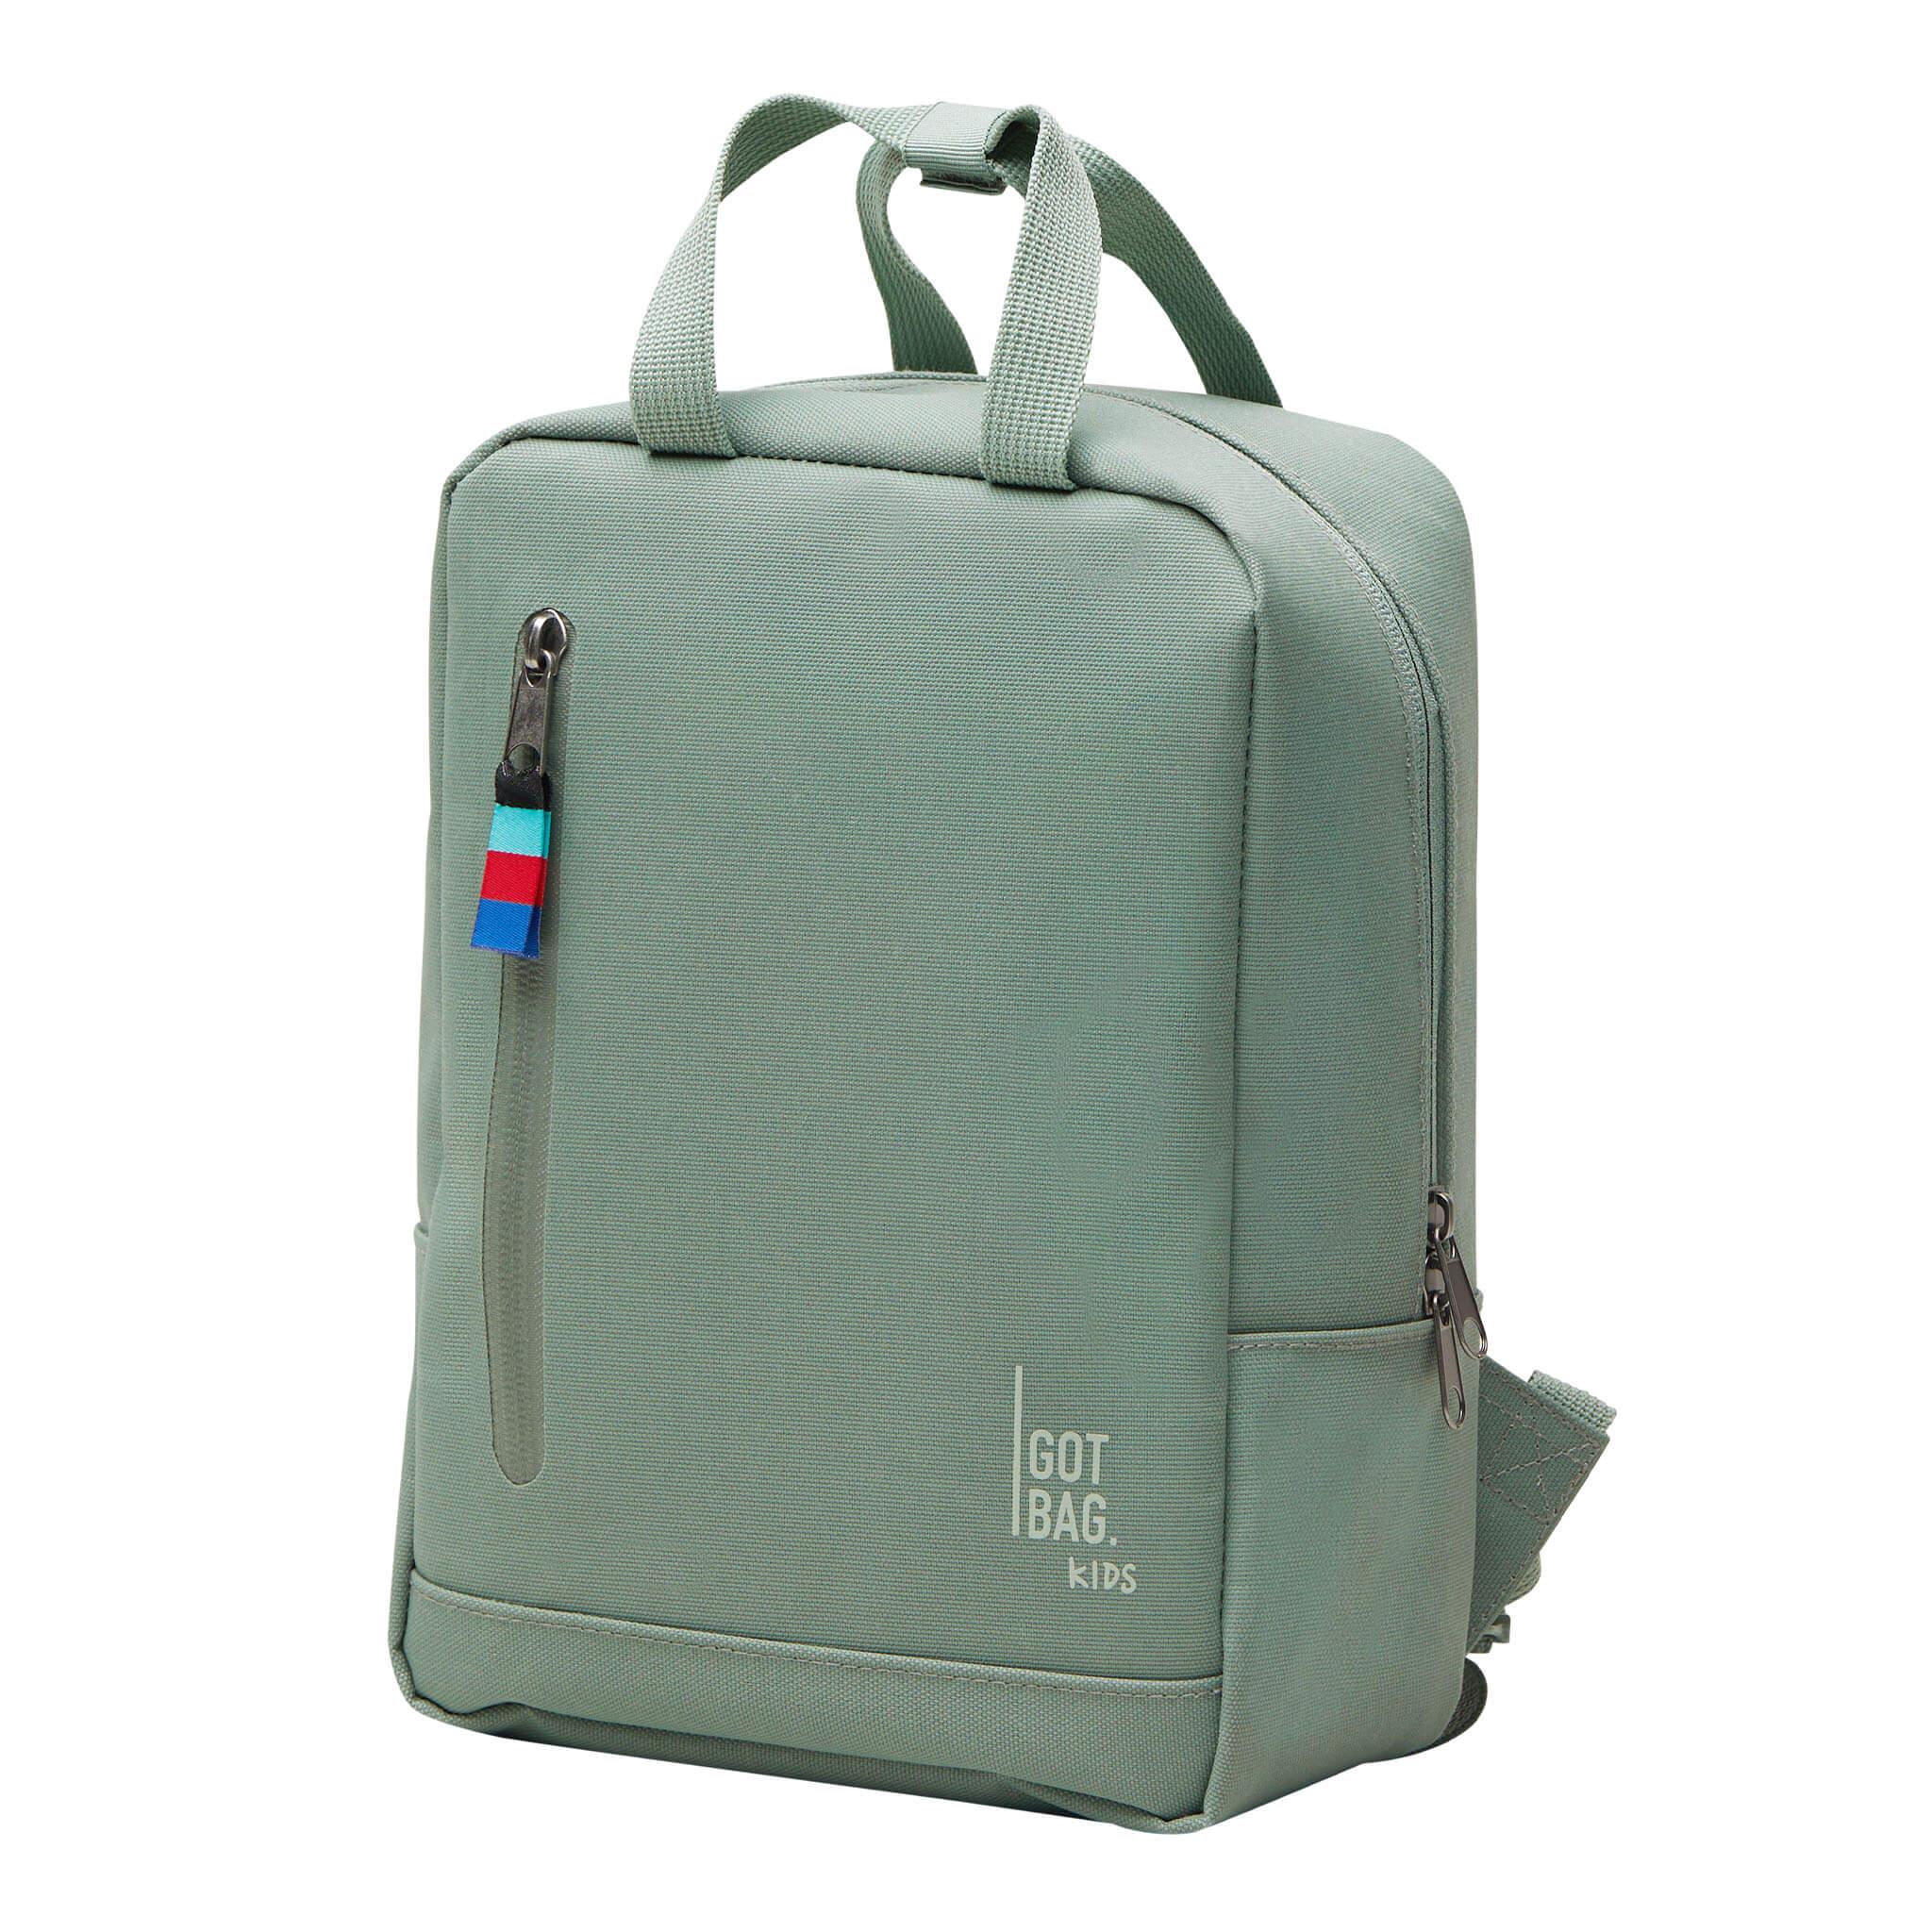 Got Bag Kids Collection- Daypack Mini - 5 Liter - Reef